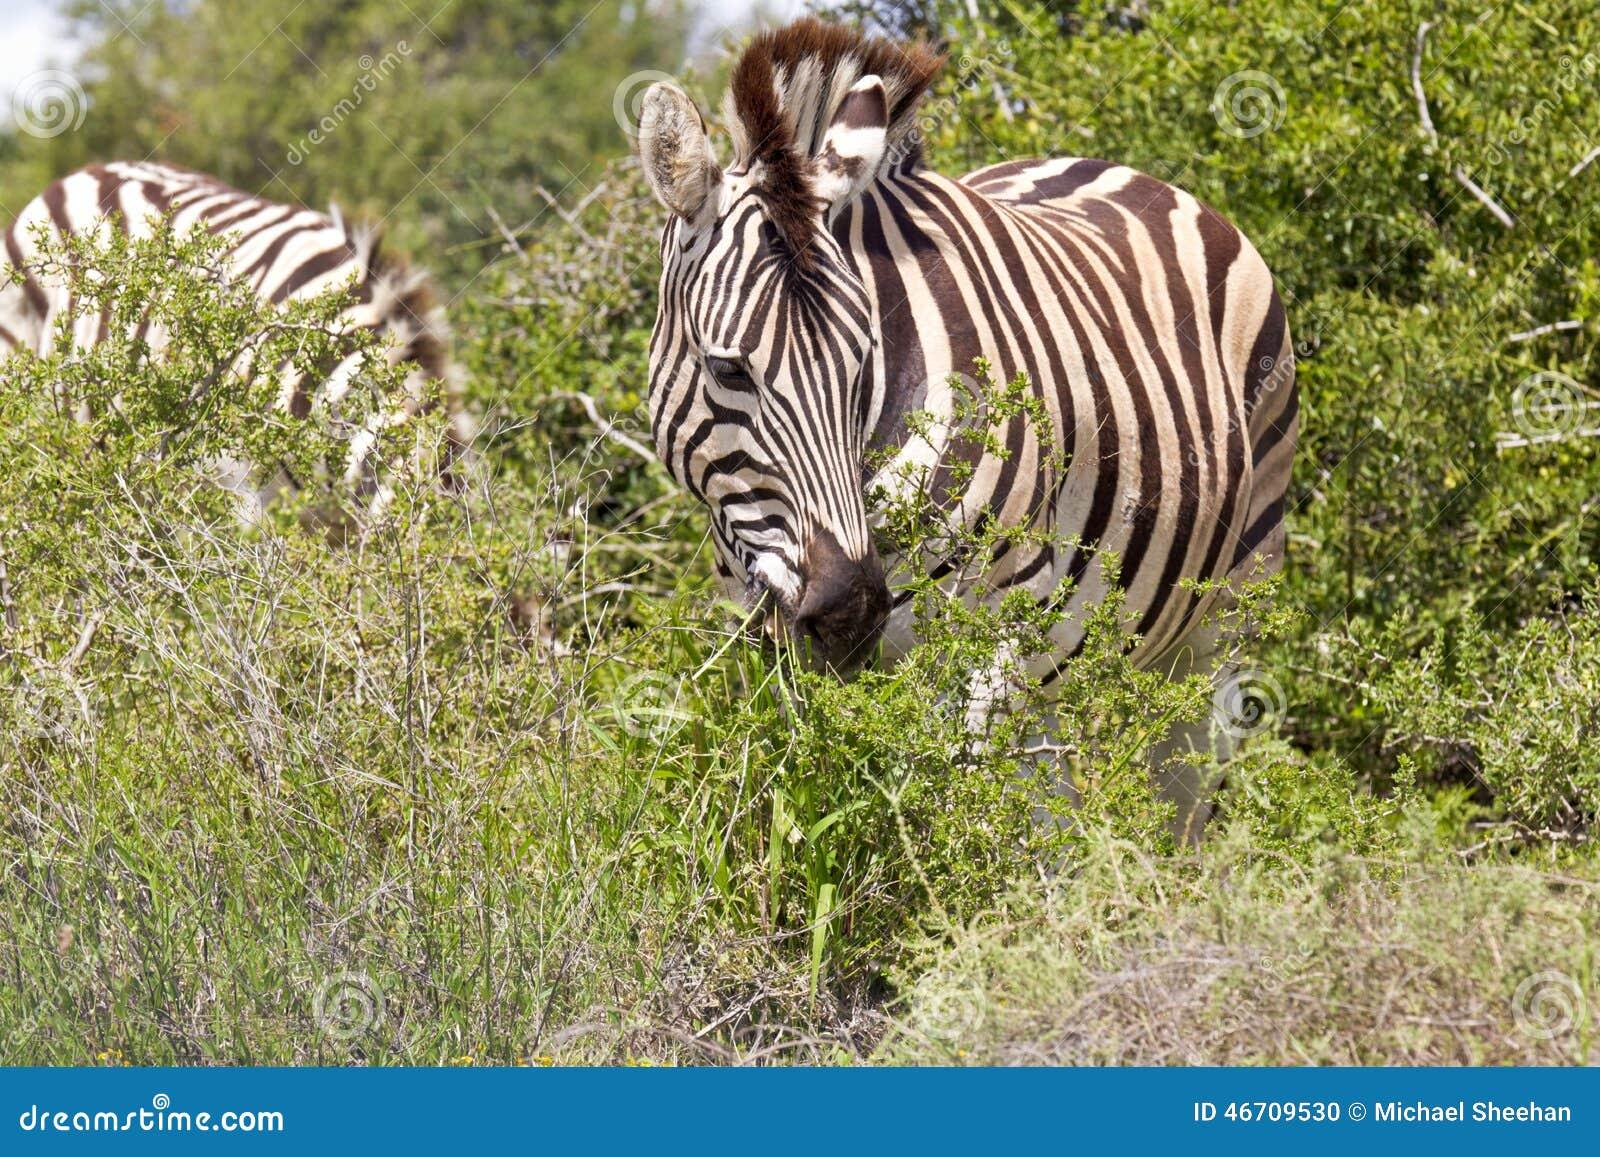 Zebra Eating Leaves Stock Photo Image 46709530